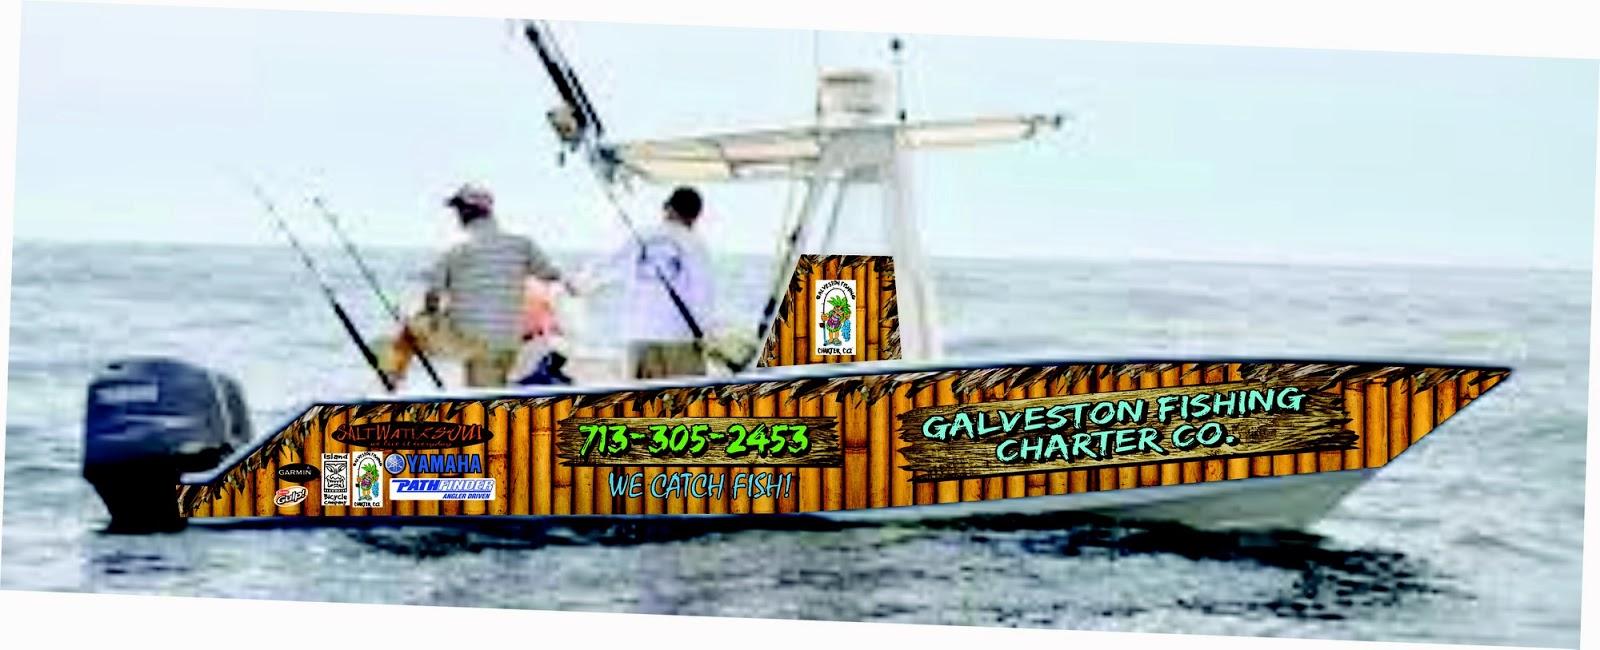 Galveston fishing galveston fishing charter company for Fishing charter galveston